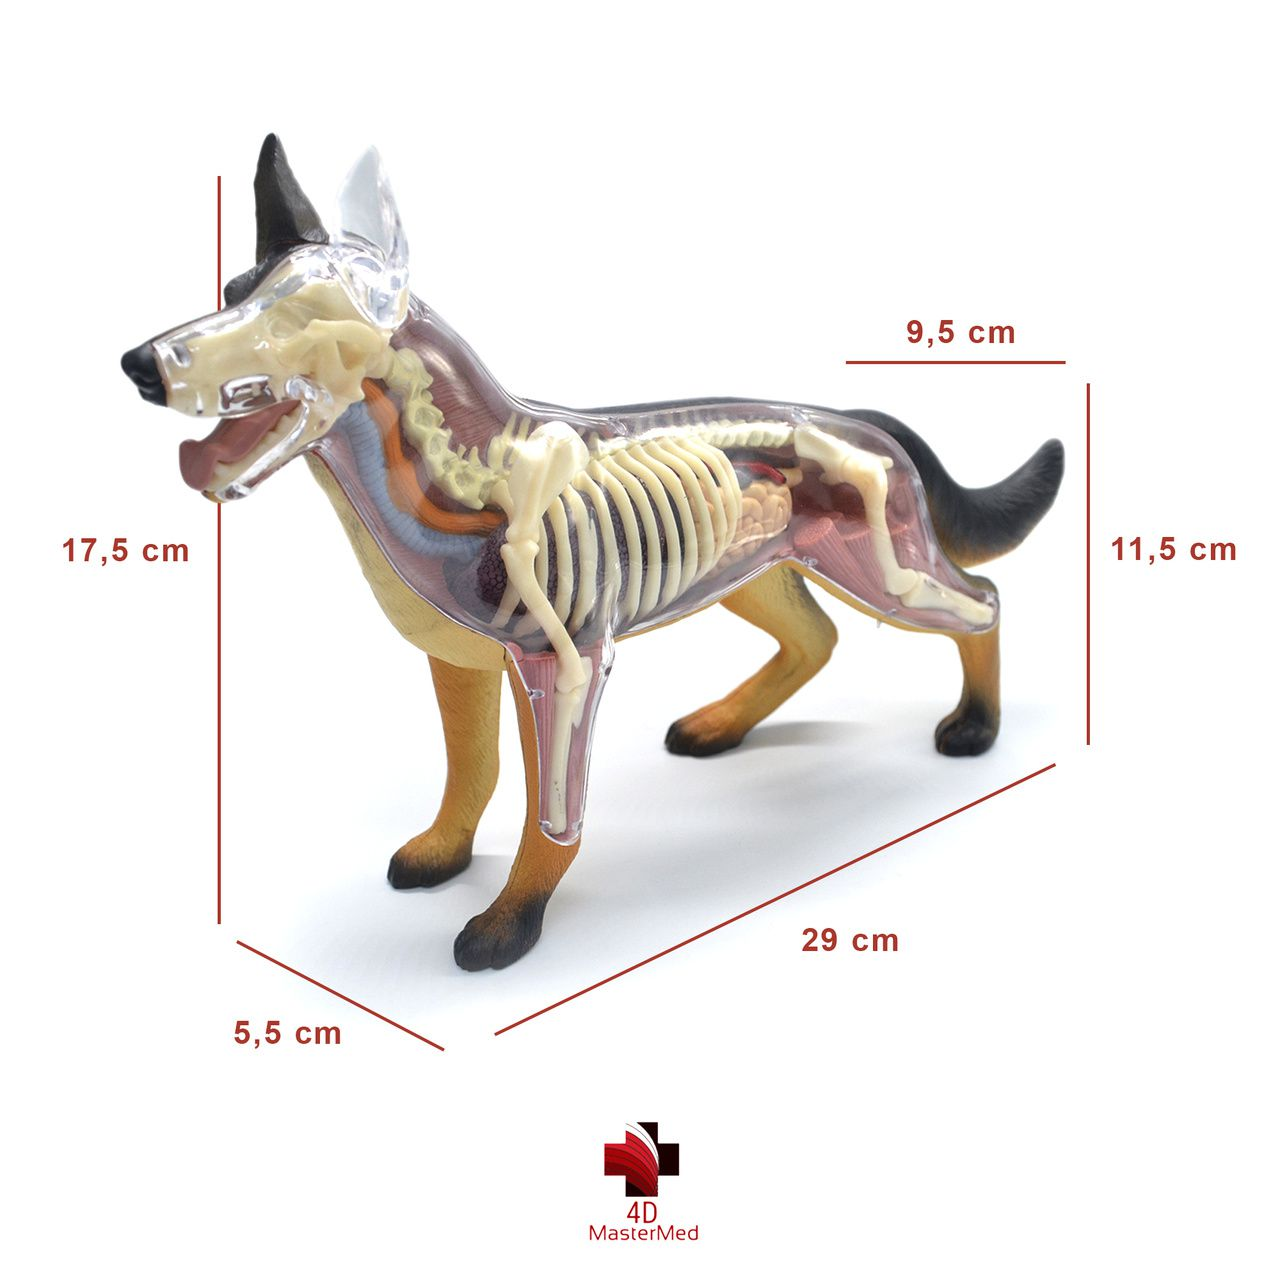 Kit Veterinário - Cachorro, Gato, Cavalo, Vaca e Porco